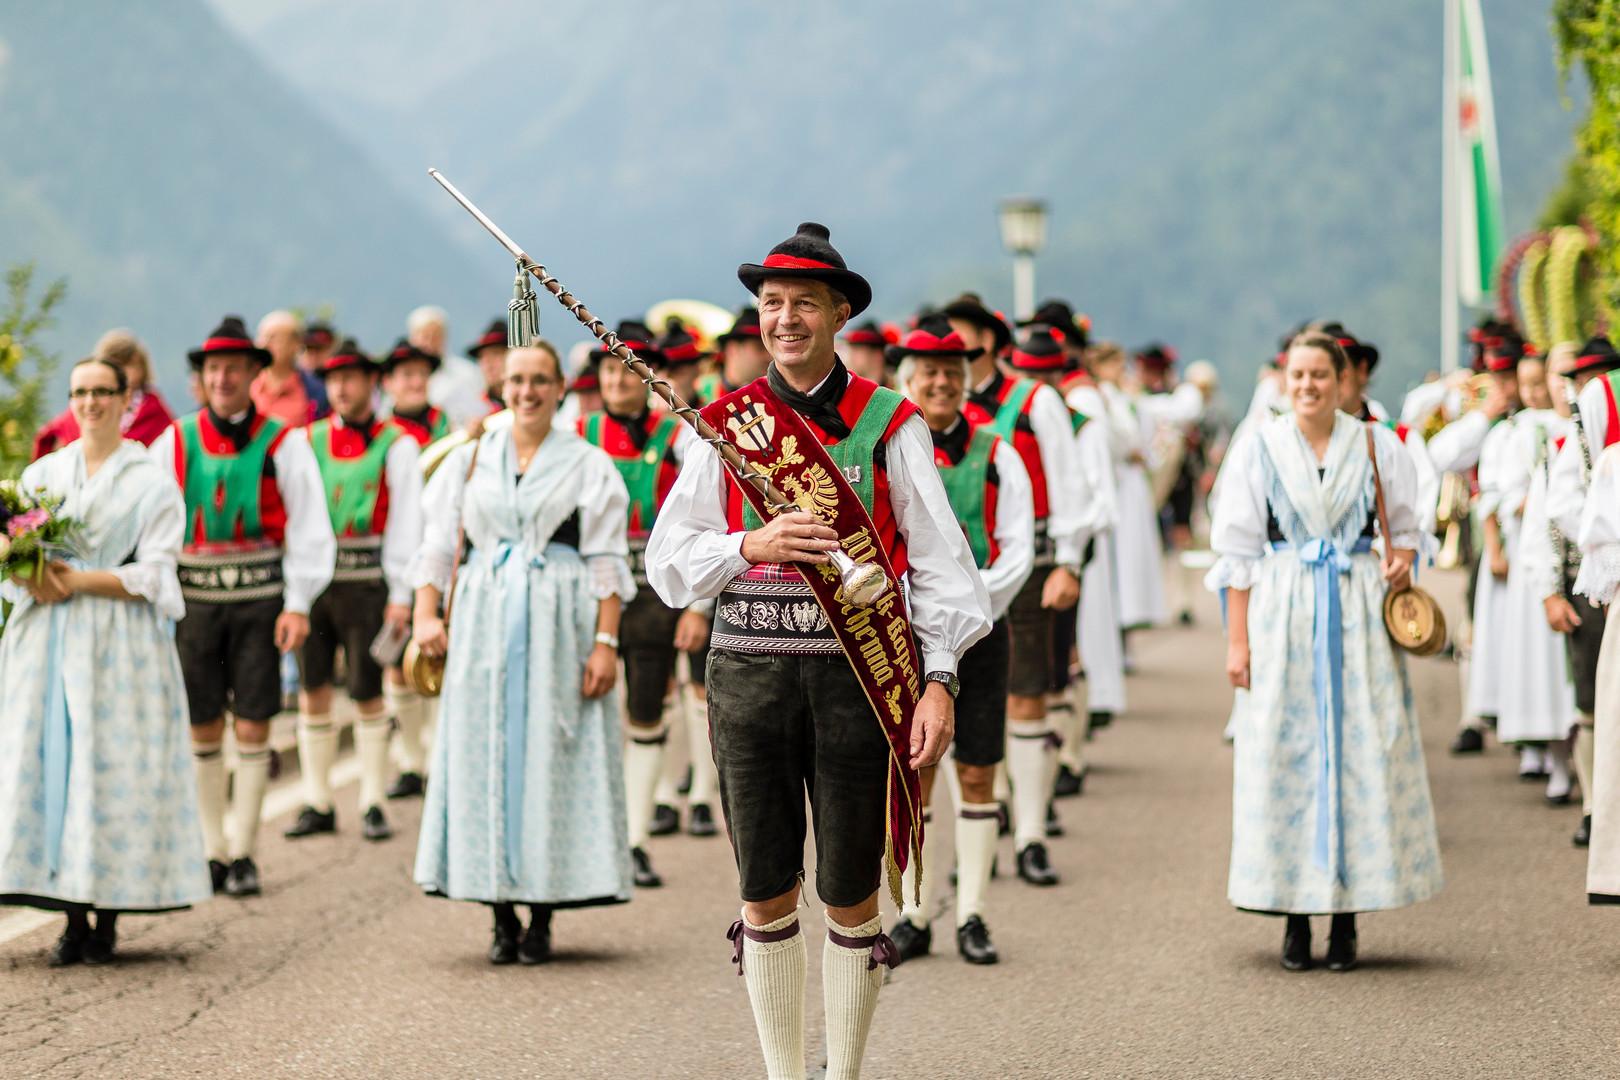 musikkappele_tradition_musik_schenna_fes